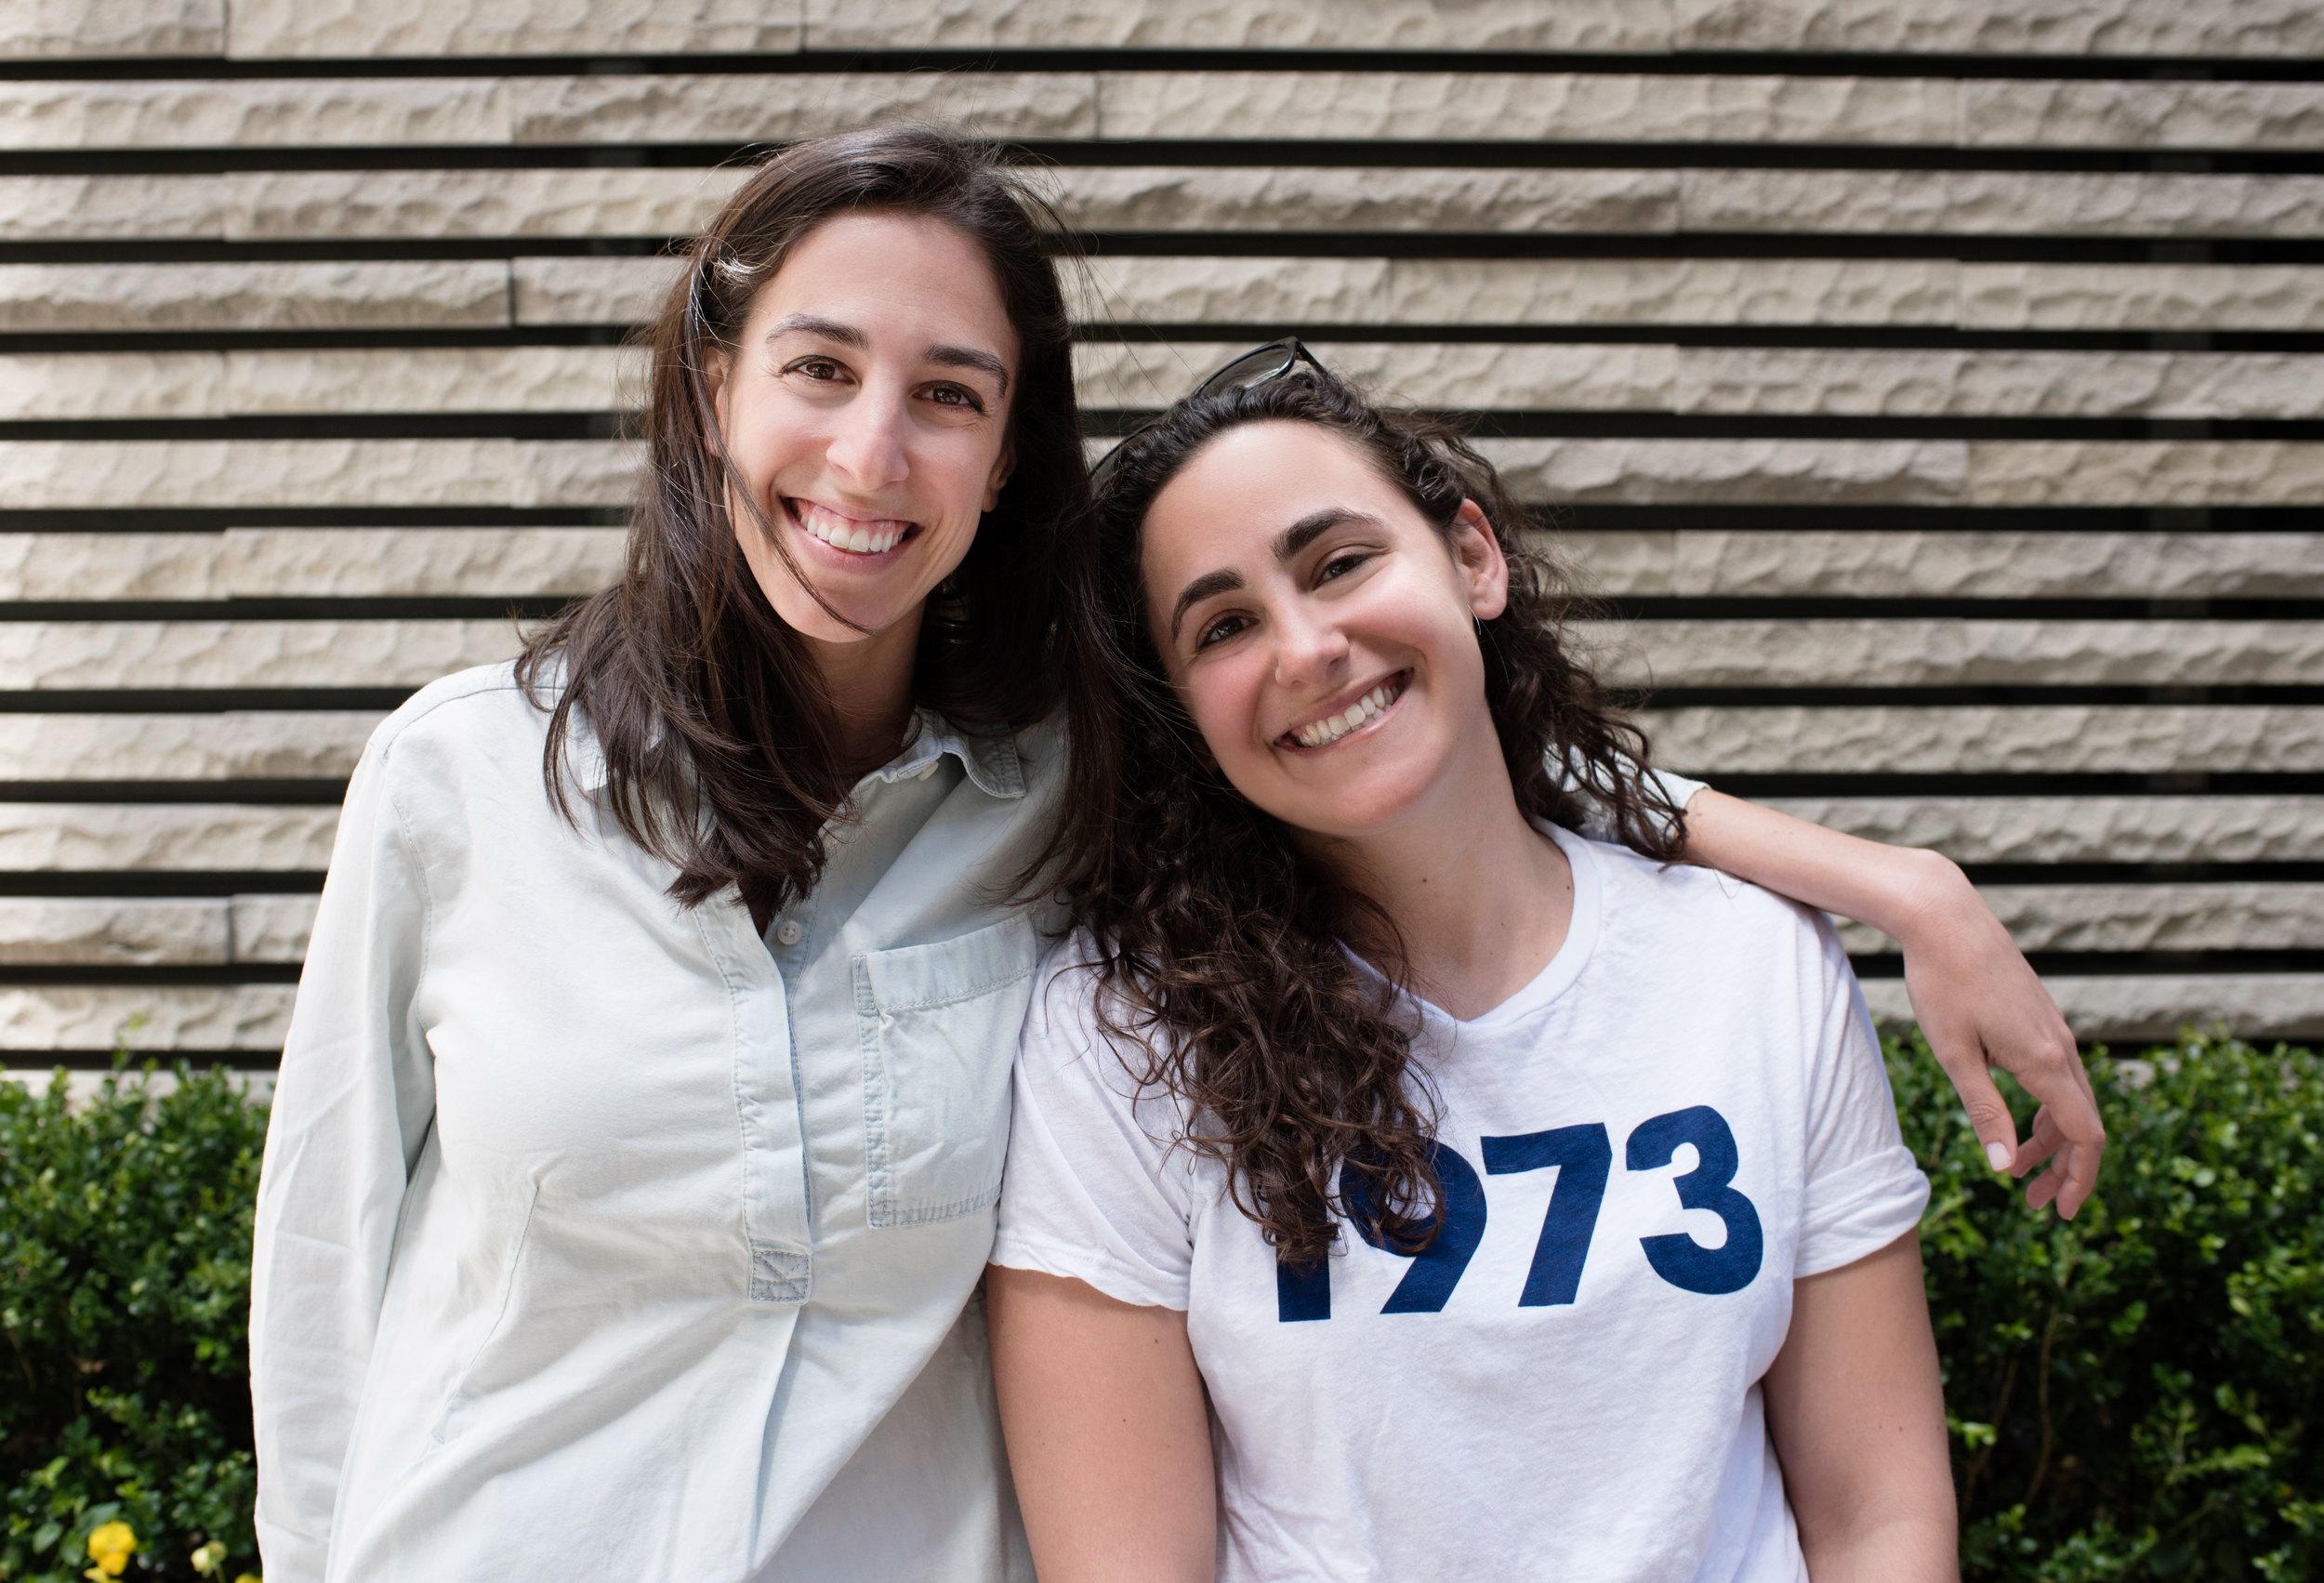 jordana kier & alexandra friedman   Founders of LOLA, Chelsea and Brooklyn Heights